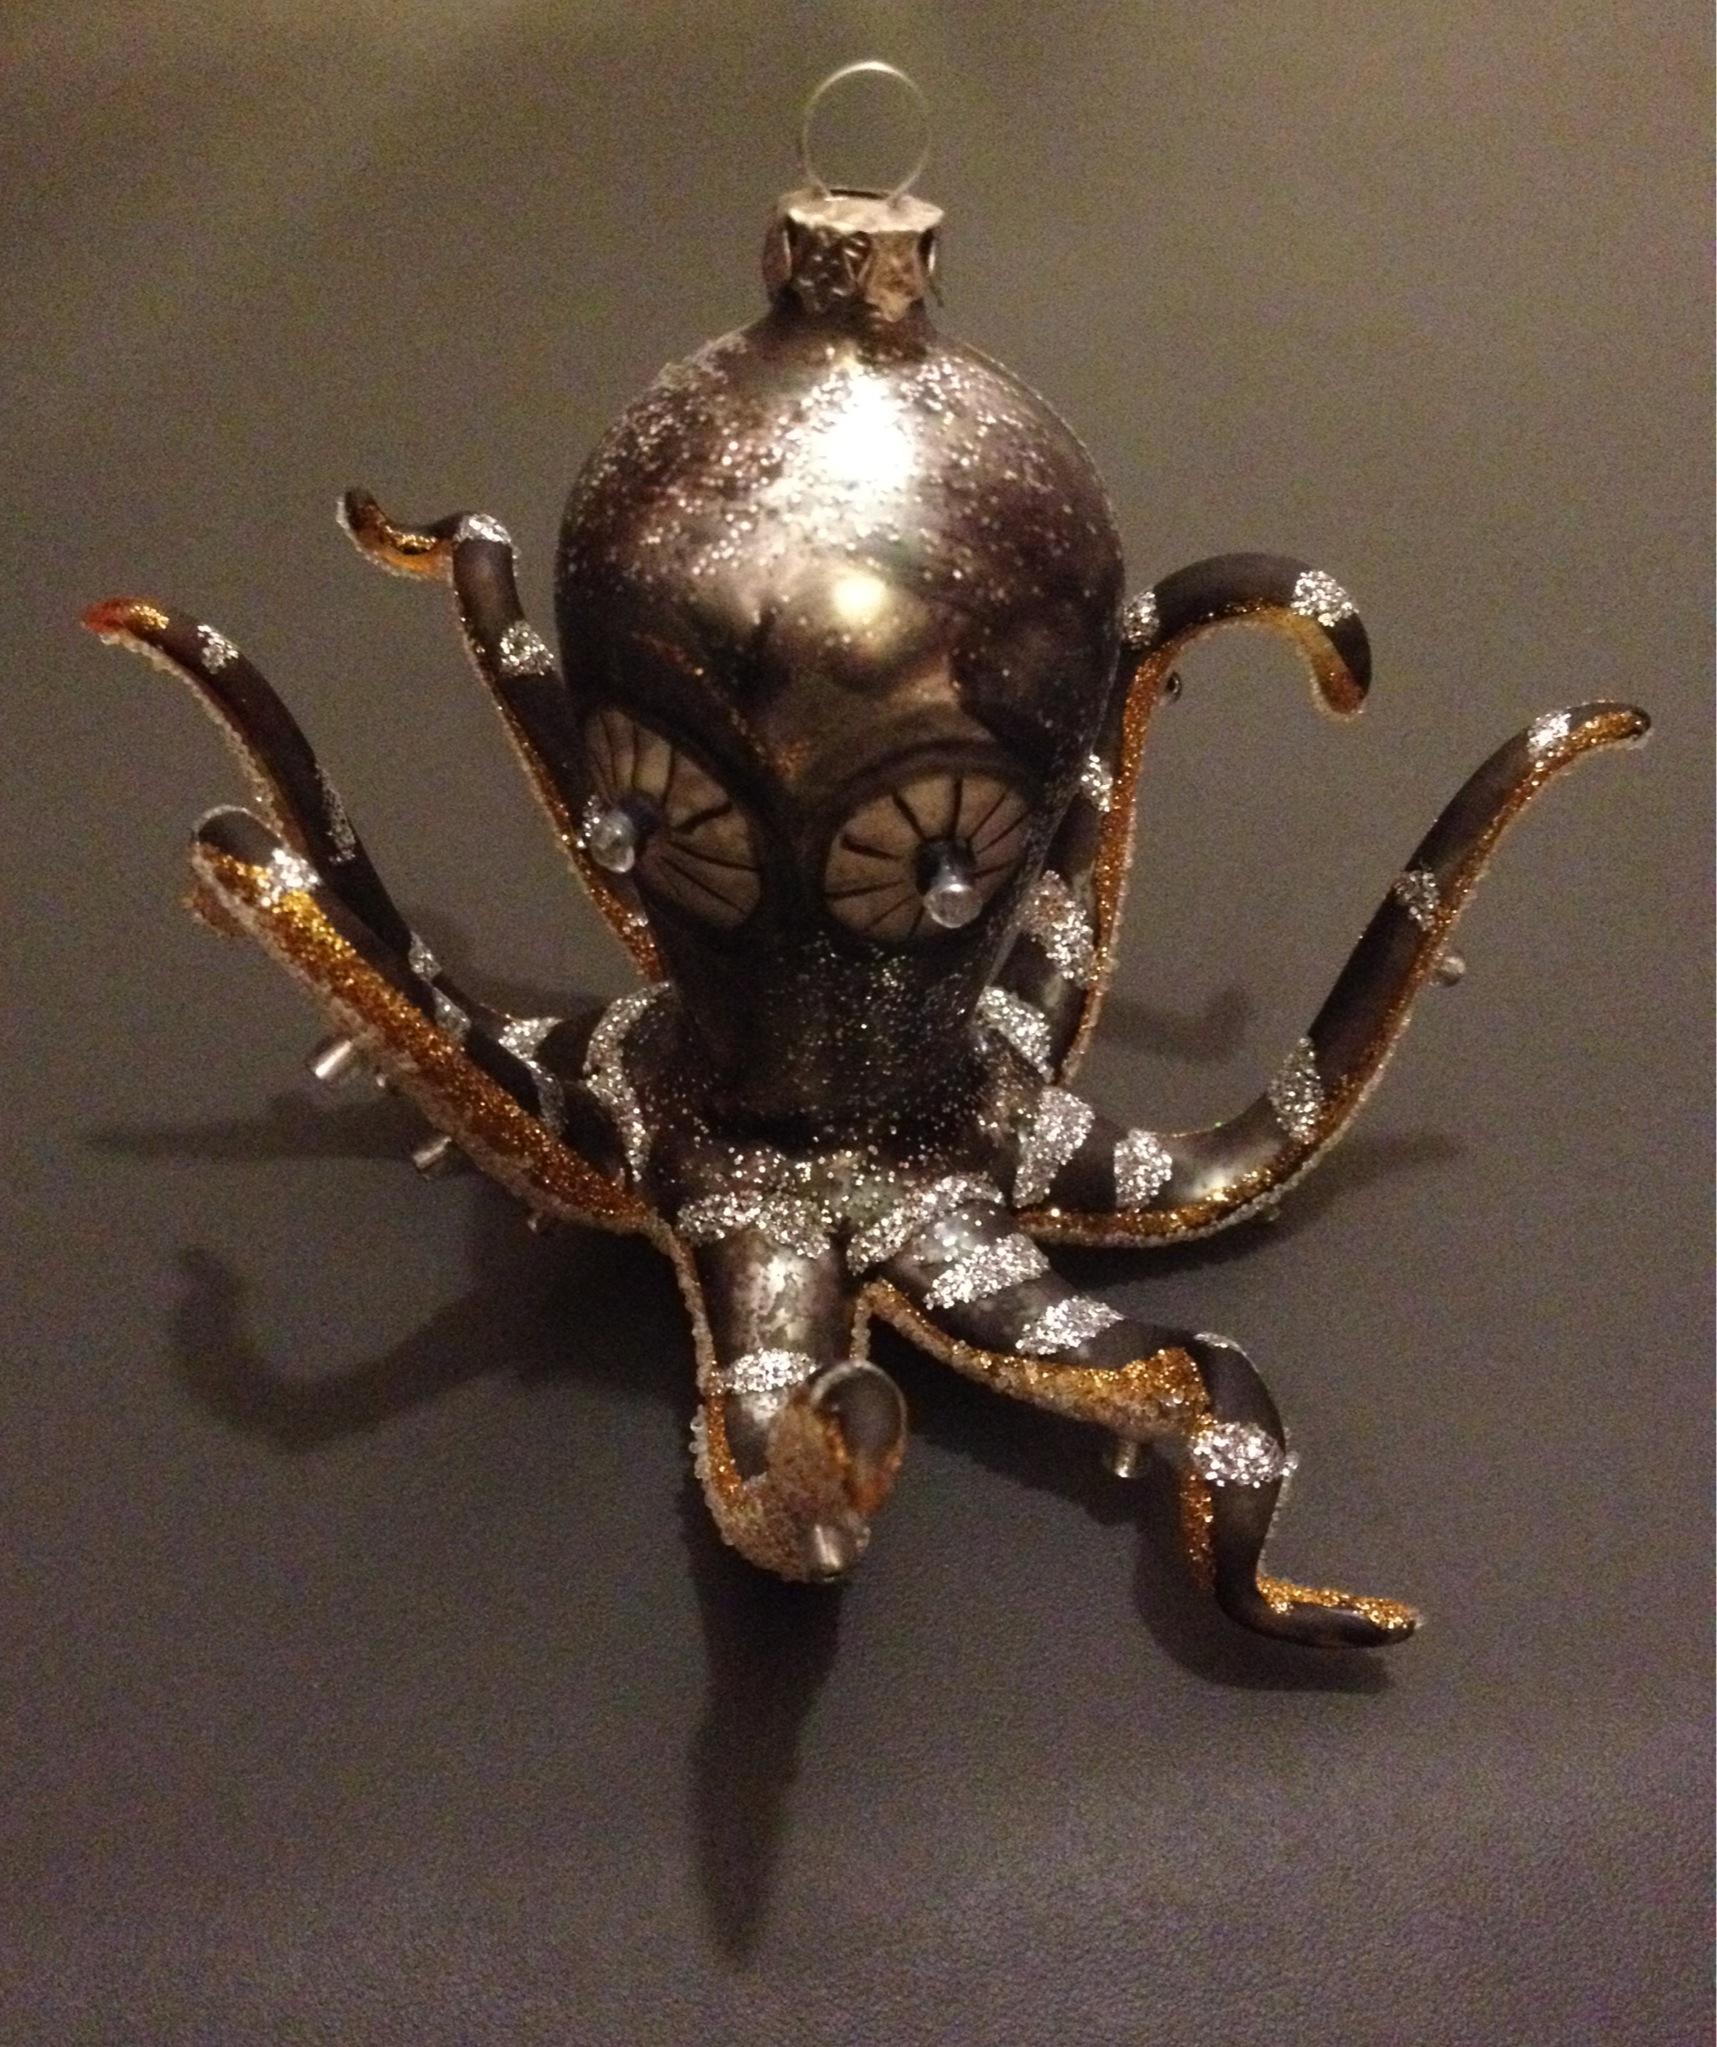 Octopus Steampunk Decoration